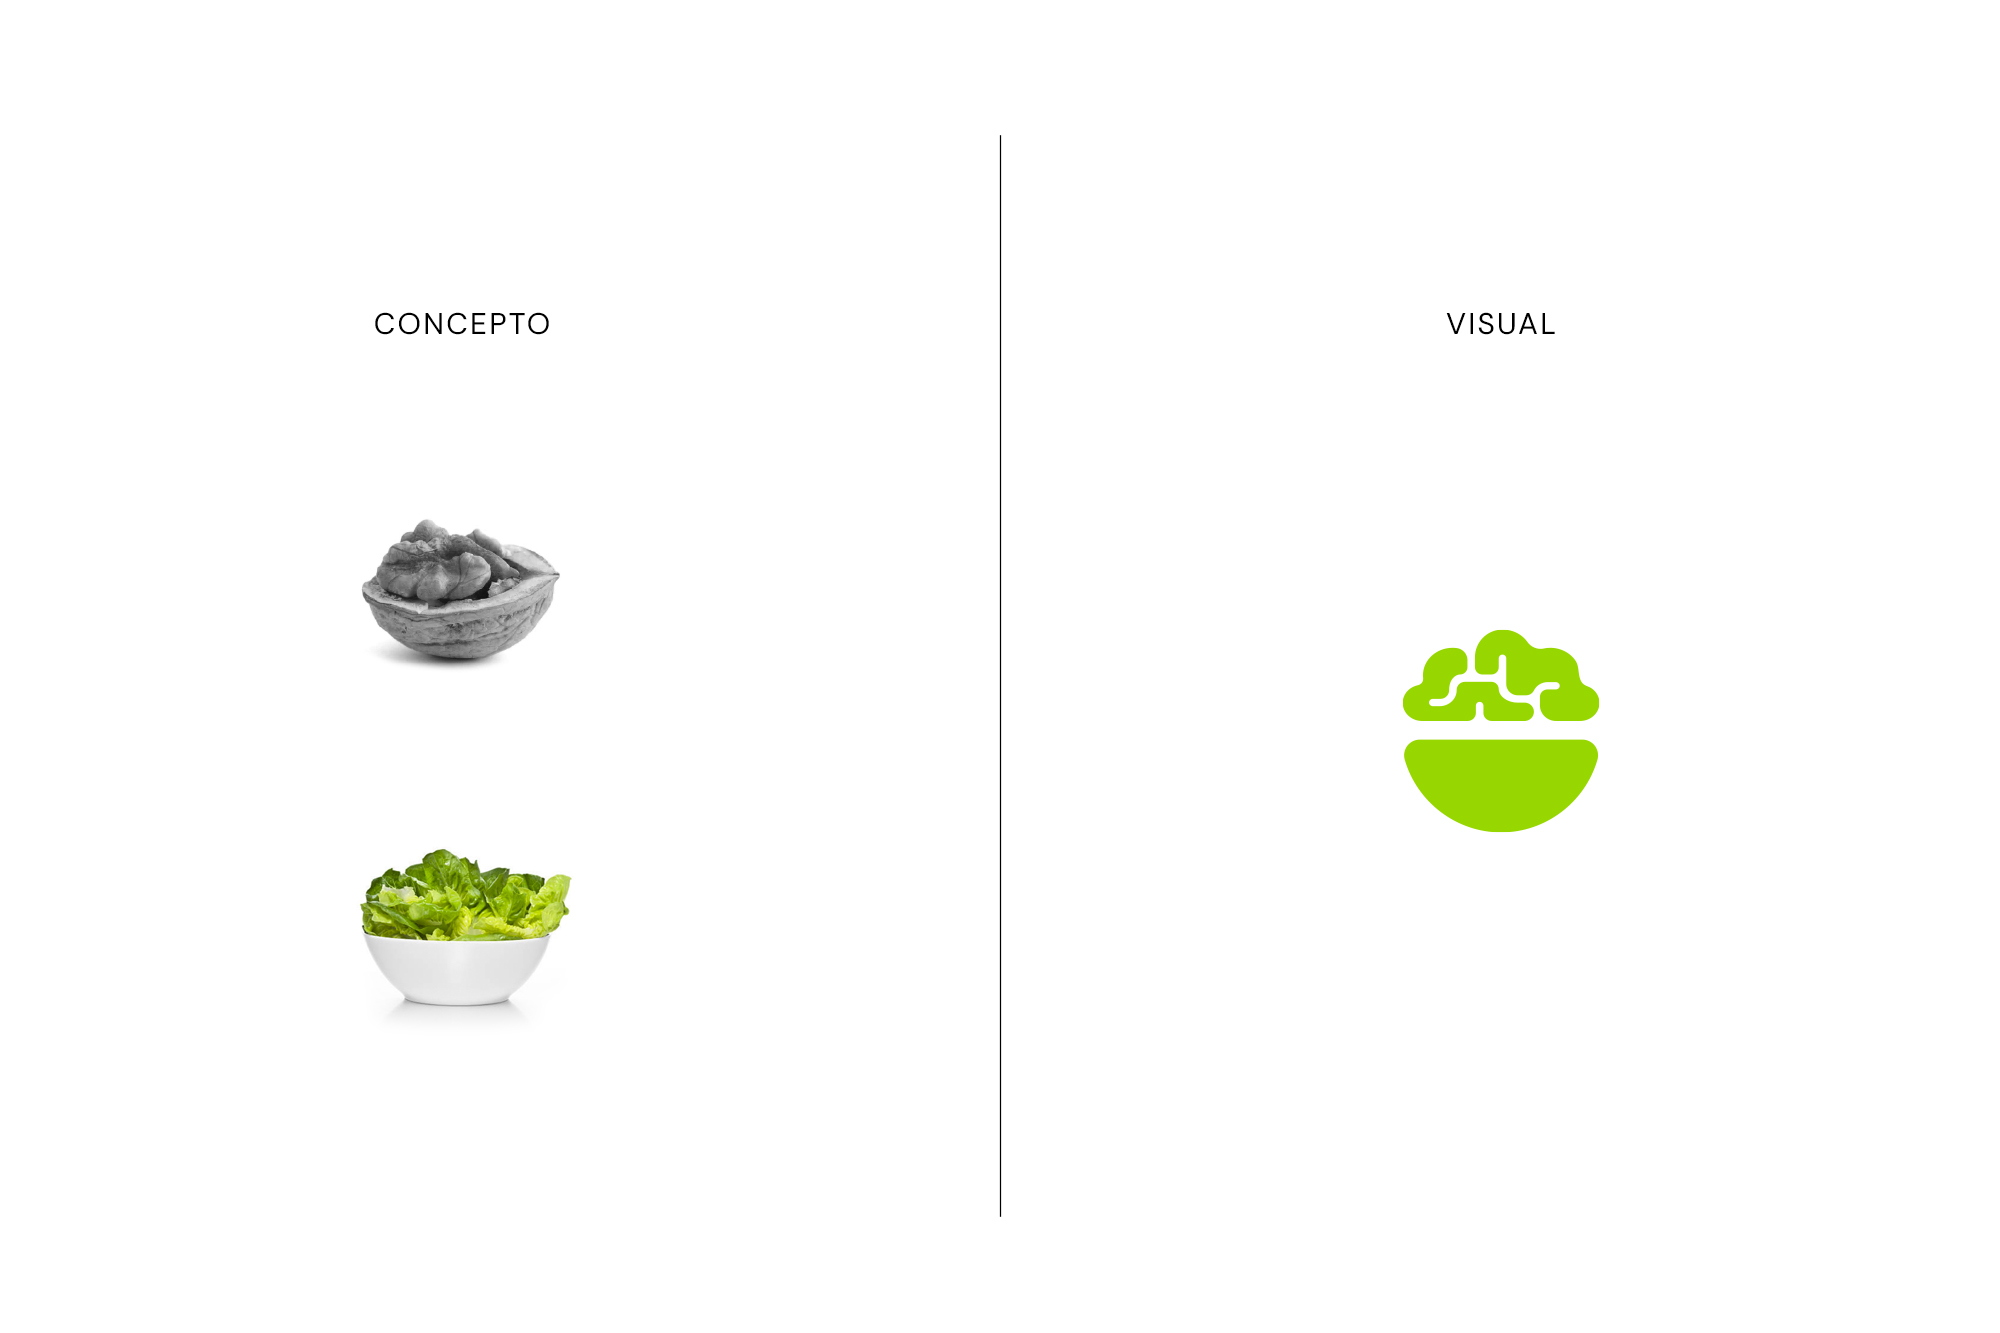 savee-concepto-visual